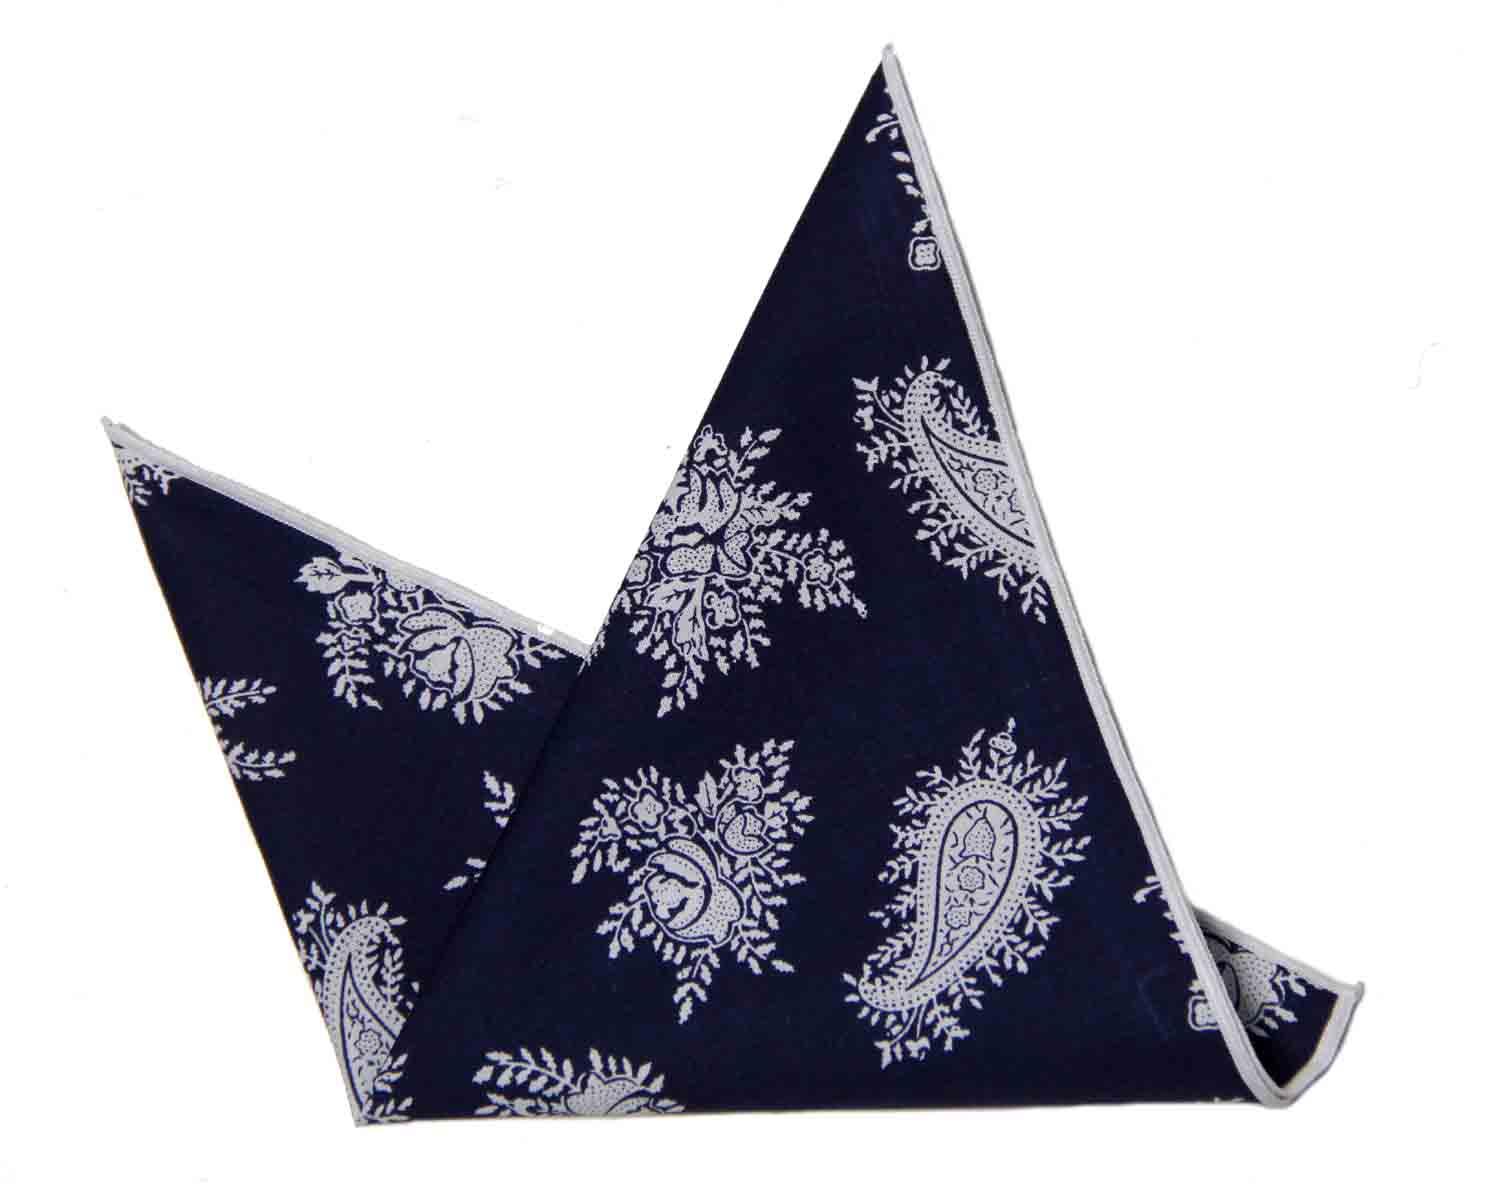 Gascoigne Pocket Square Cotton Navy Blue White Floral and Paisley Men's